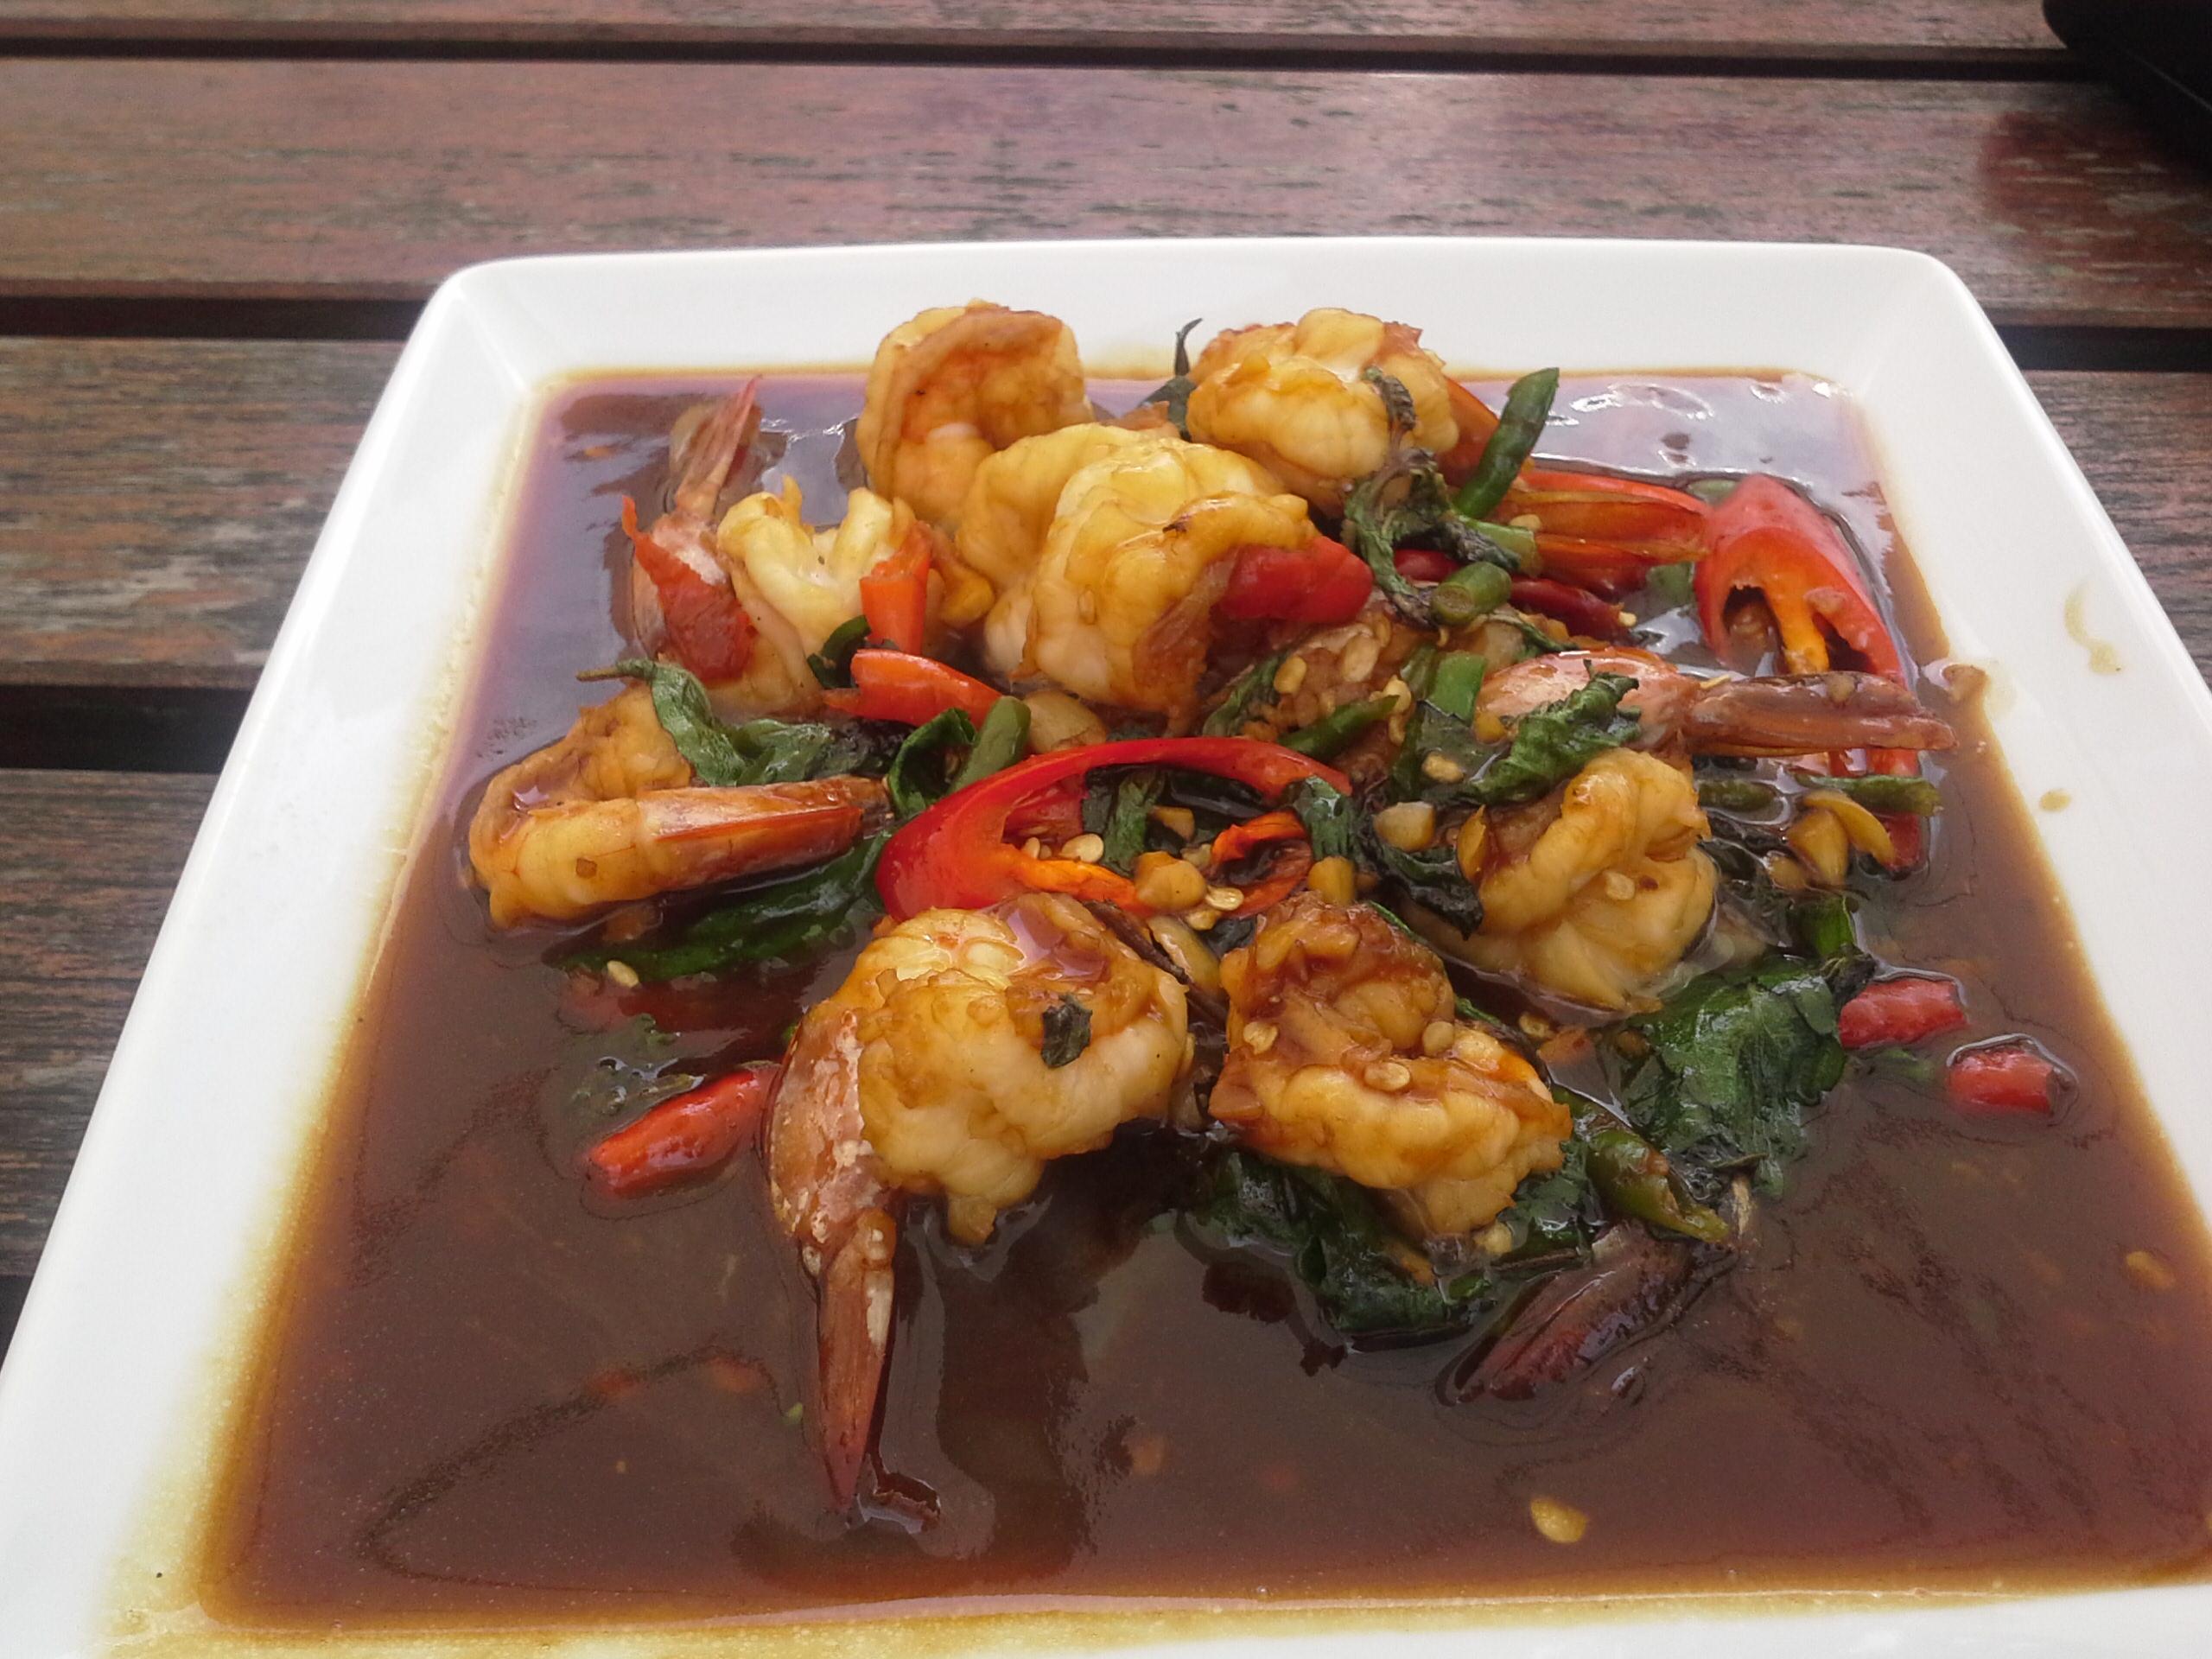 Crevettes sauce tamarin aux herbes